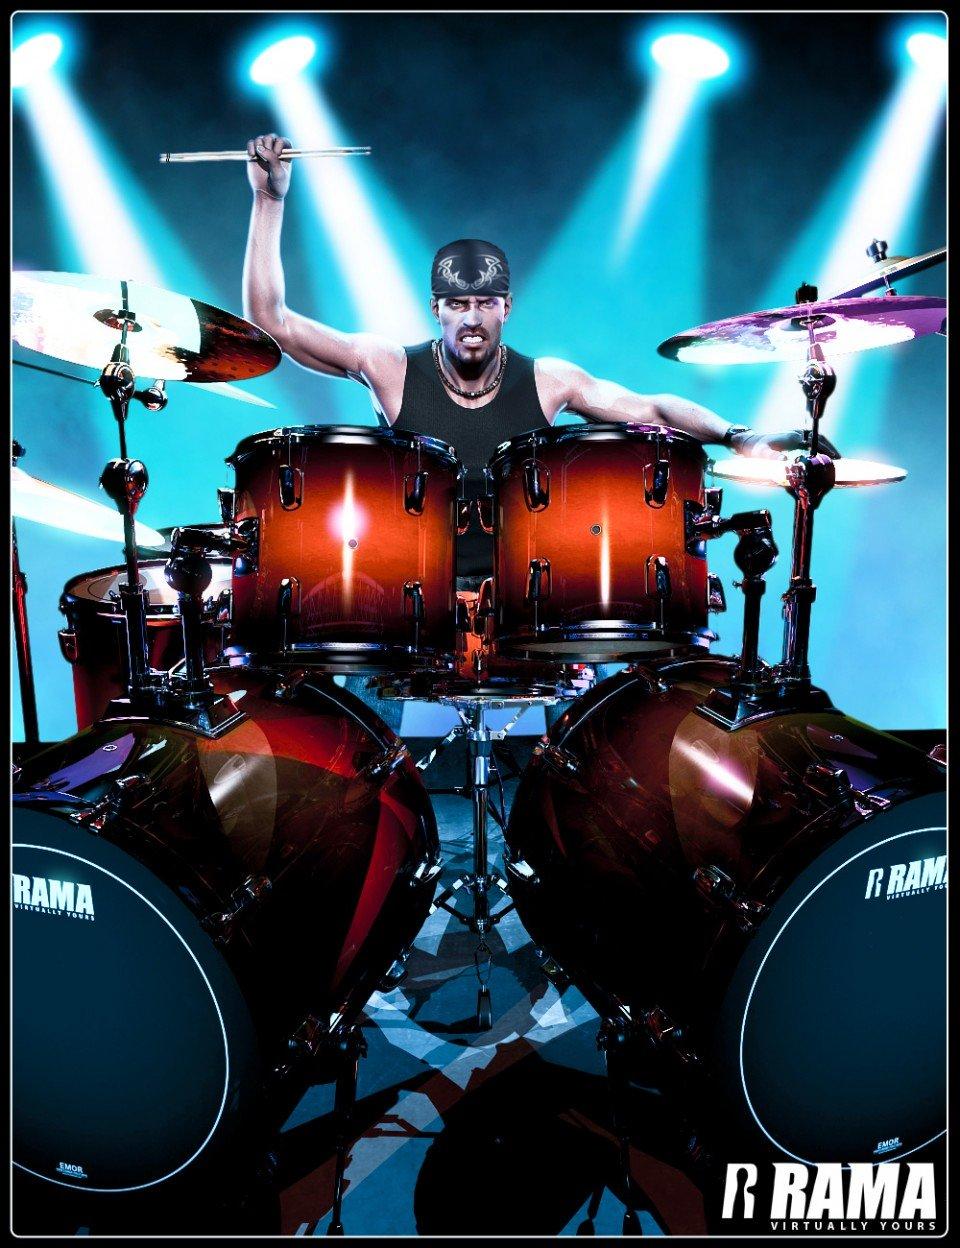 Rama Drums & Add-ons_DAZ3D下载站